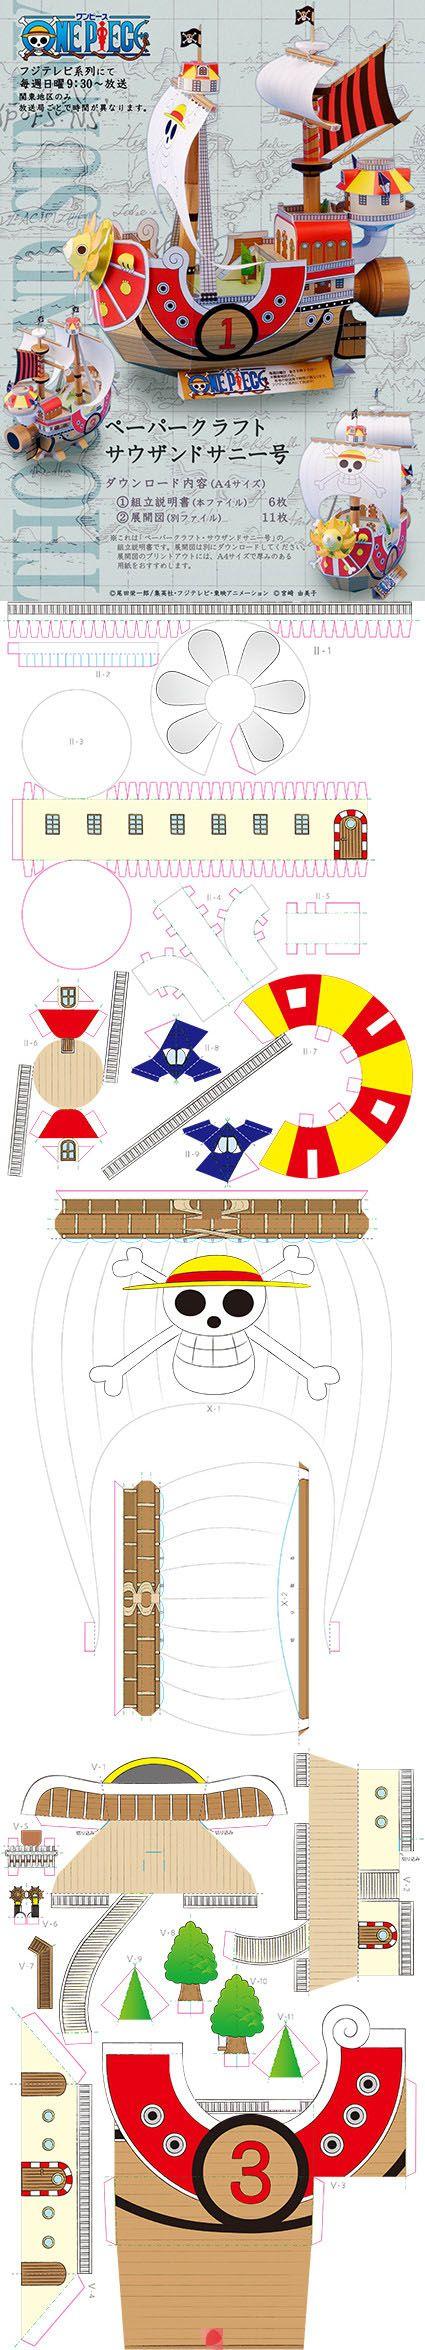 Cut out Pirate ship